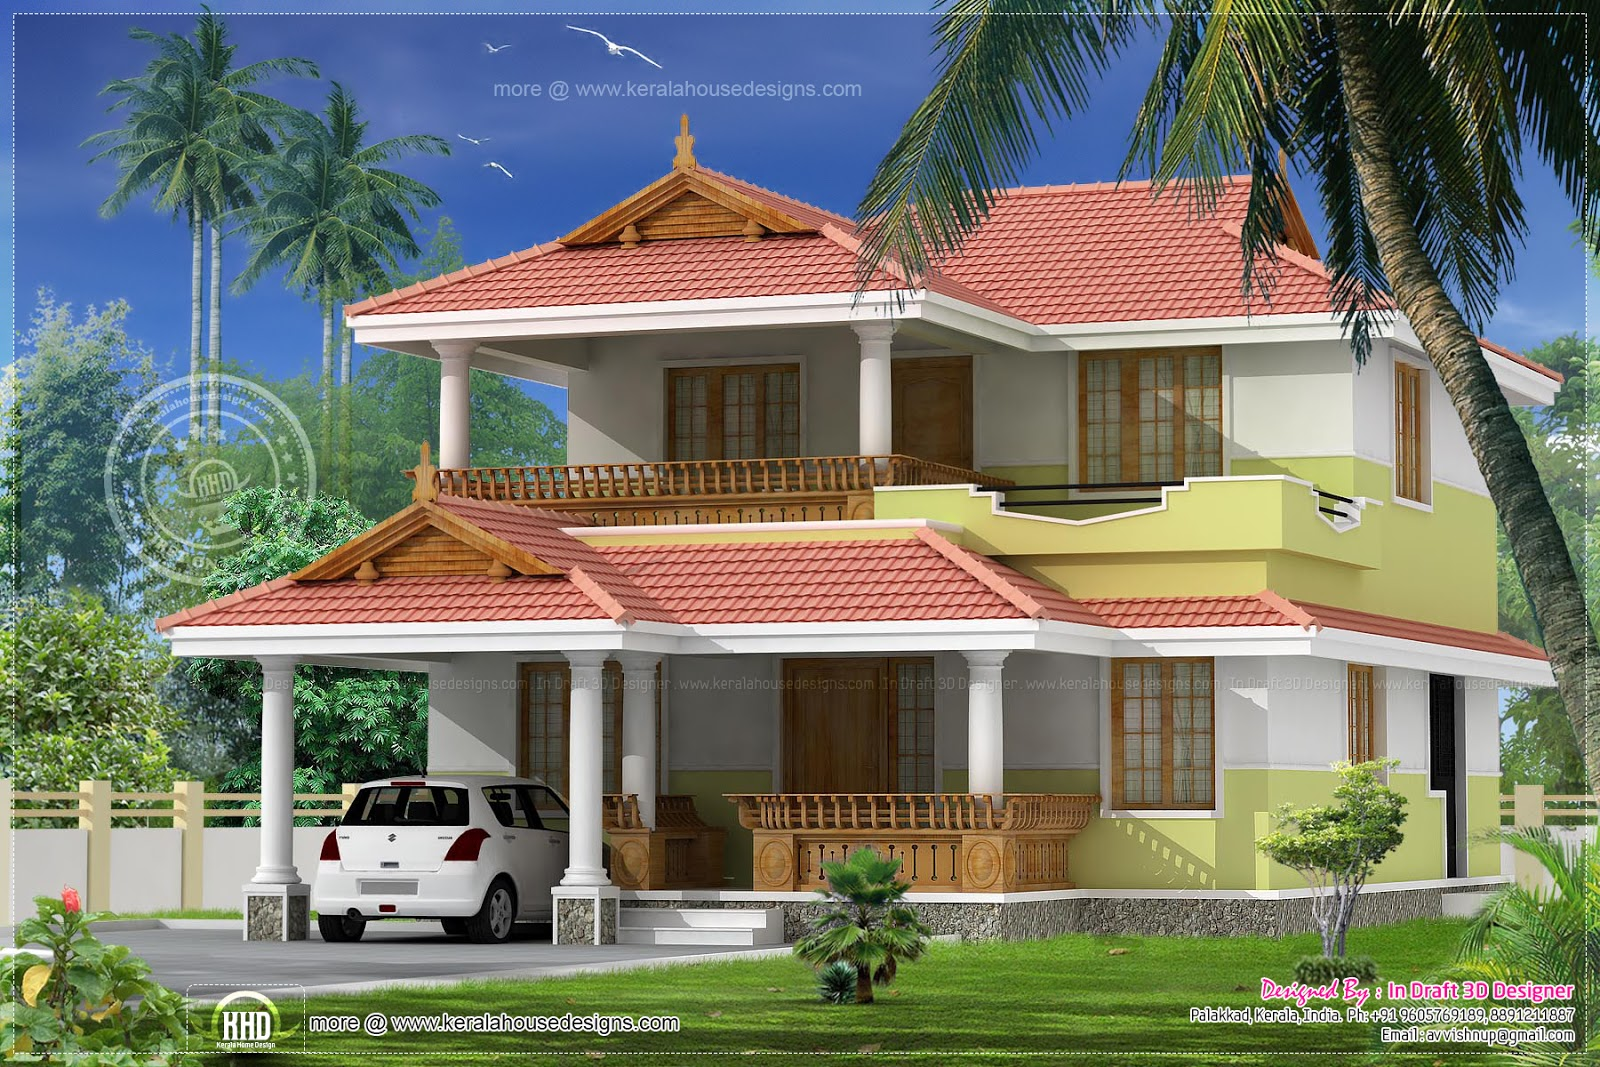 3 Bed room traditional villa 1740 sq.feet - Kerala home ...